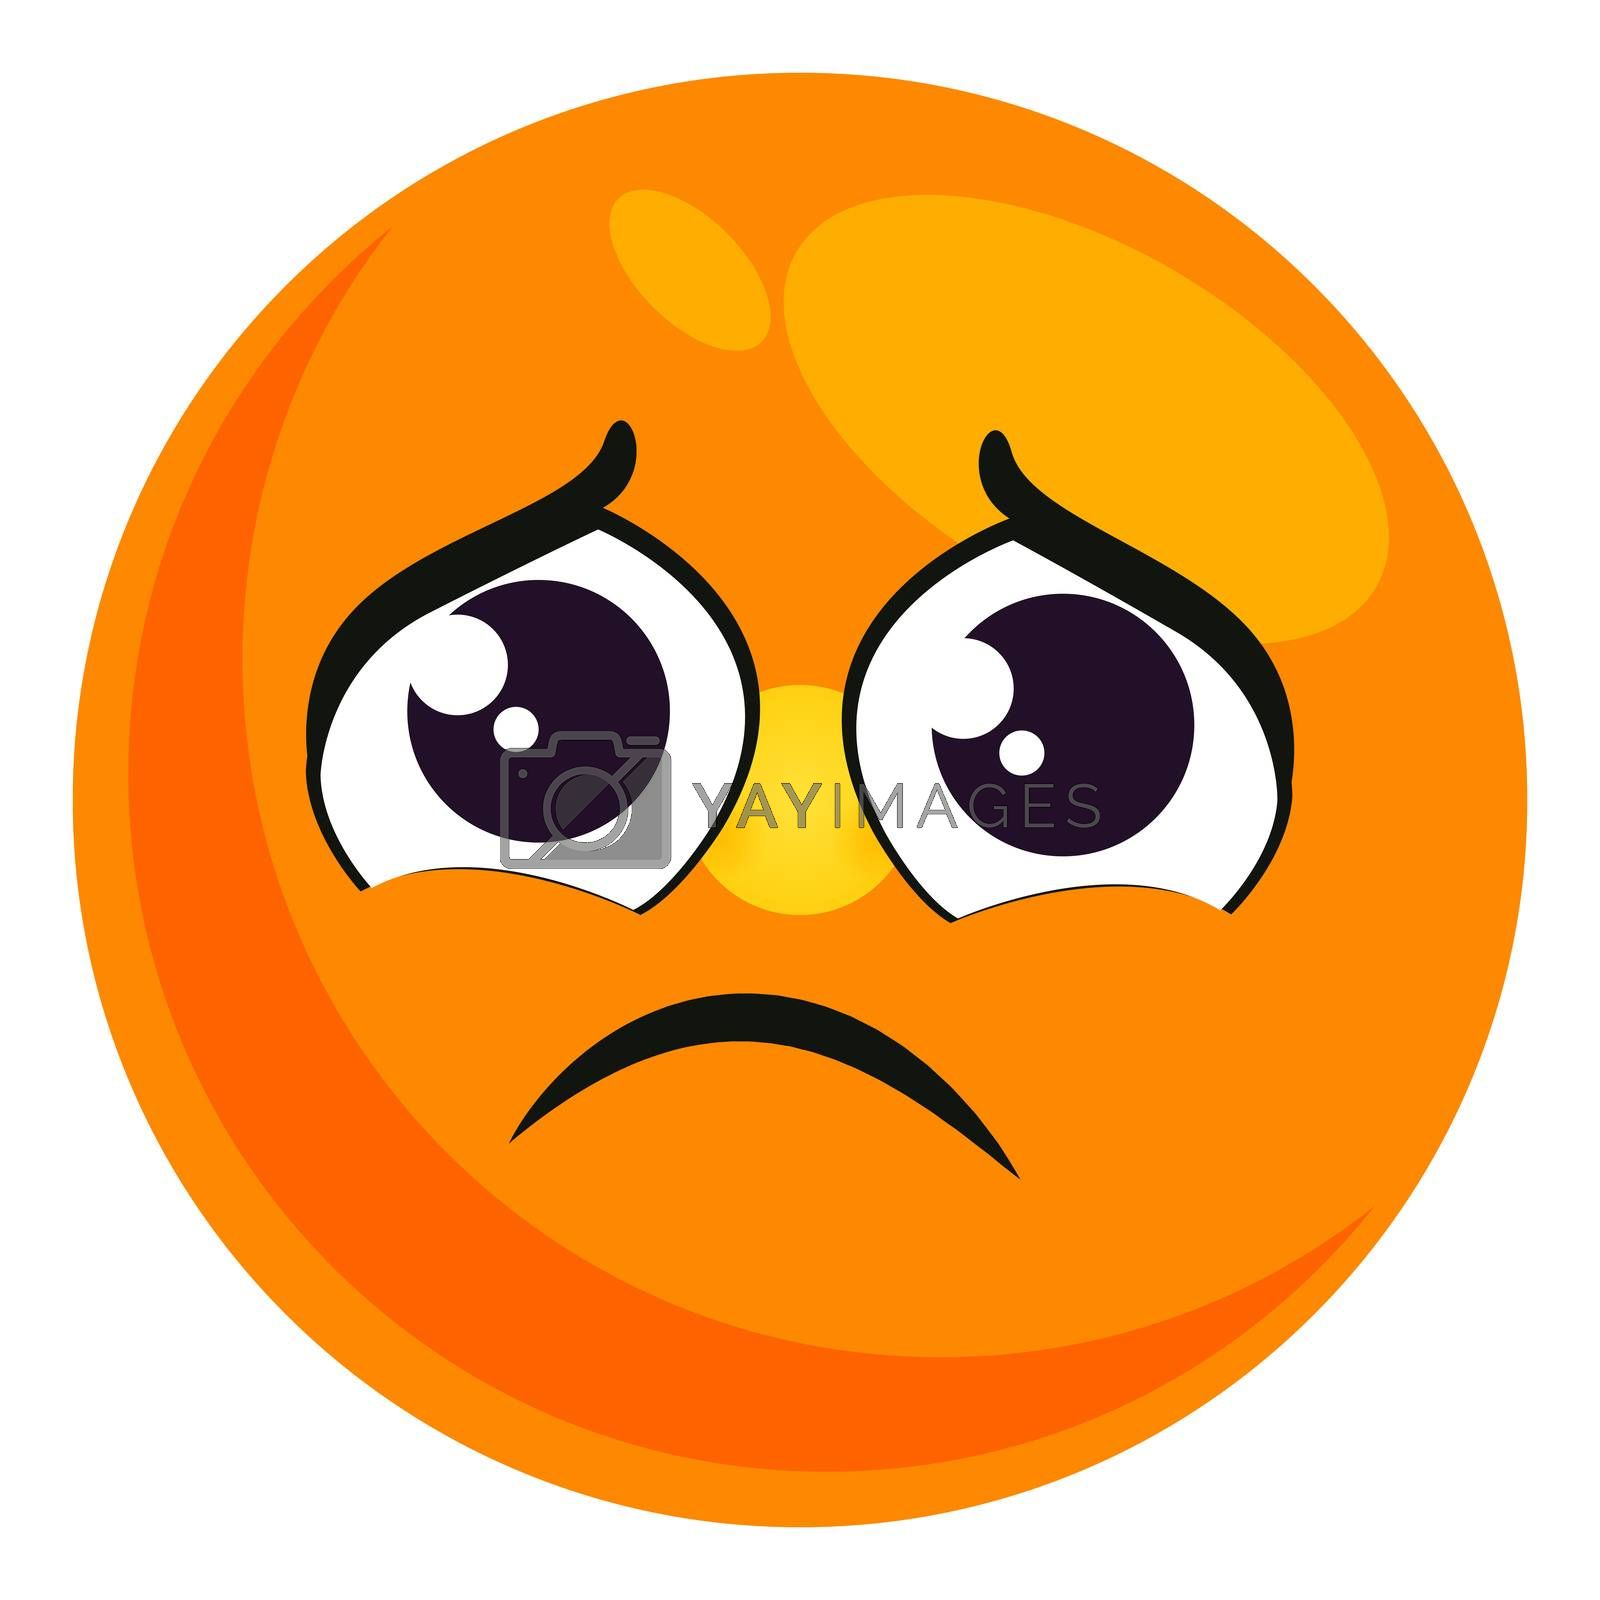 Very sad emoji, illustration, vector on white background